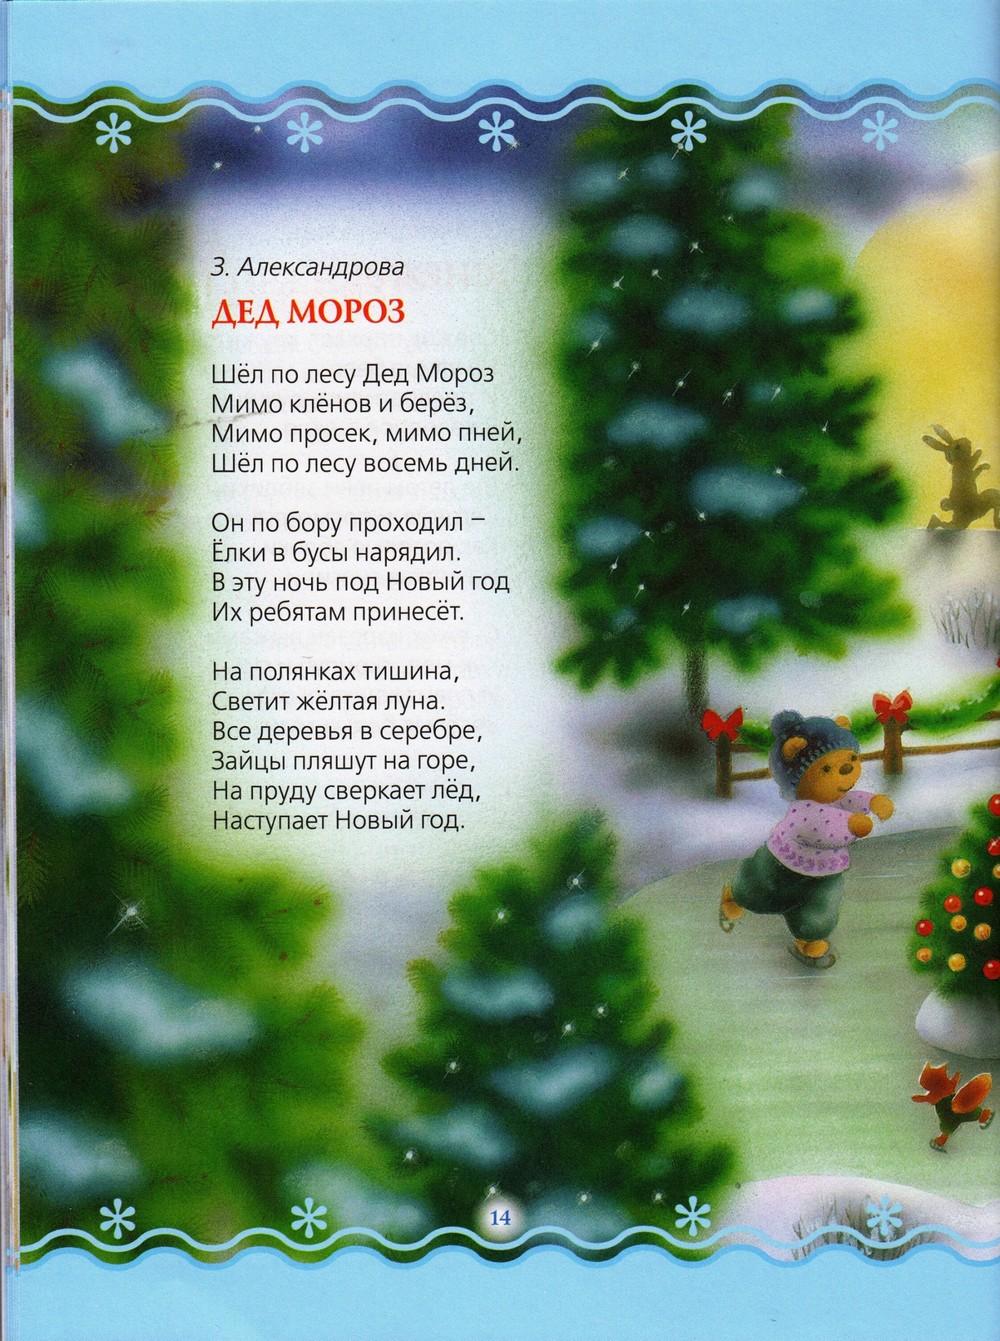 http://i2.imageban.ru/out/2013/12/19/3cfd676e64ff14988cb4e07500ddefa1.jpg